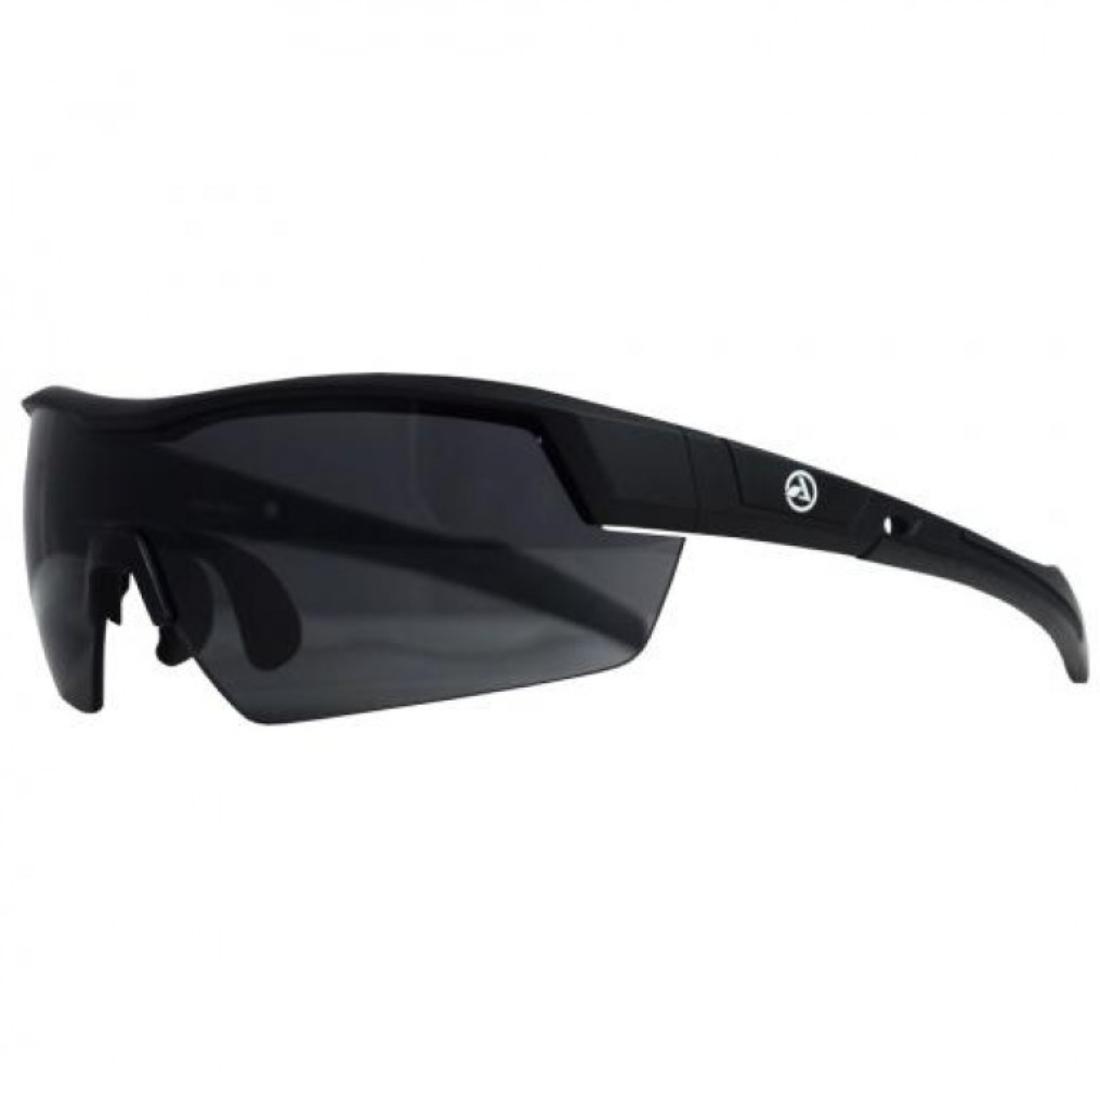 Óculos Absolute Race Rx Anti Uv 400 Mtb Ciclismo Preto